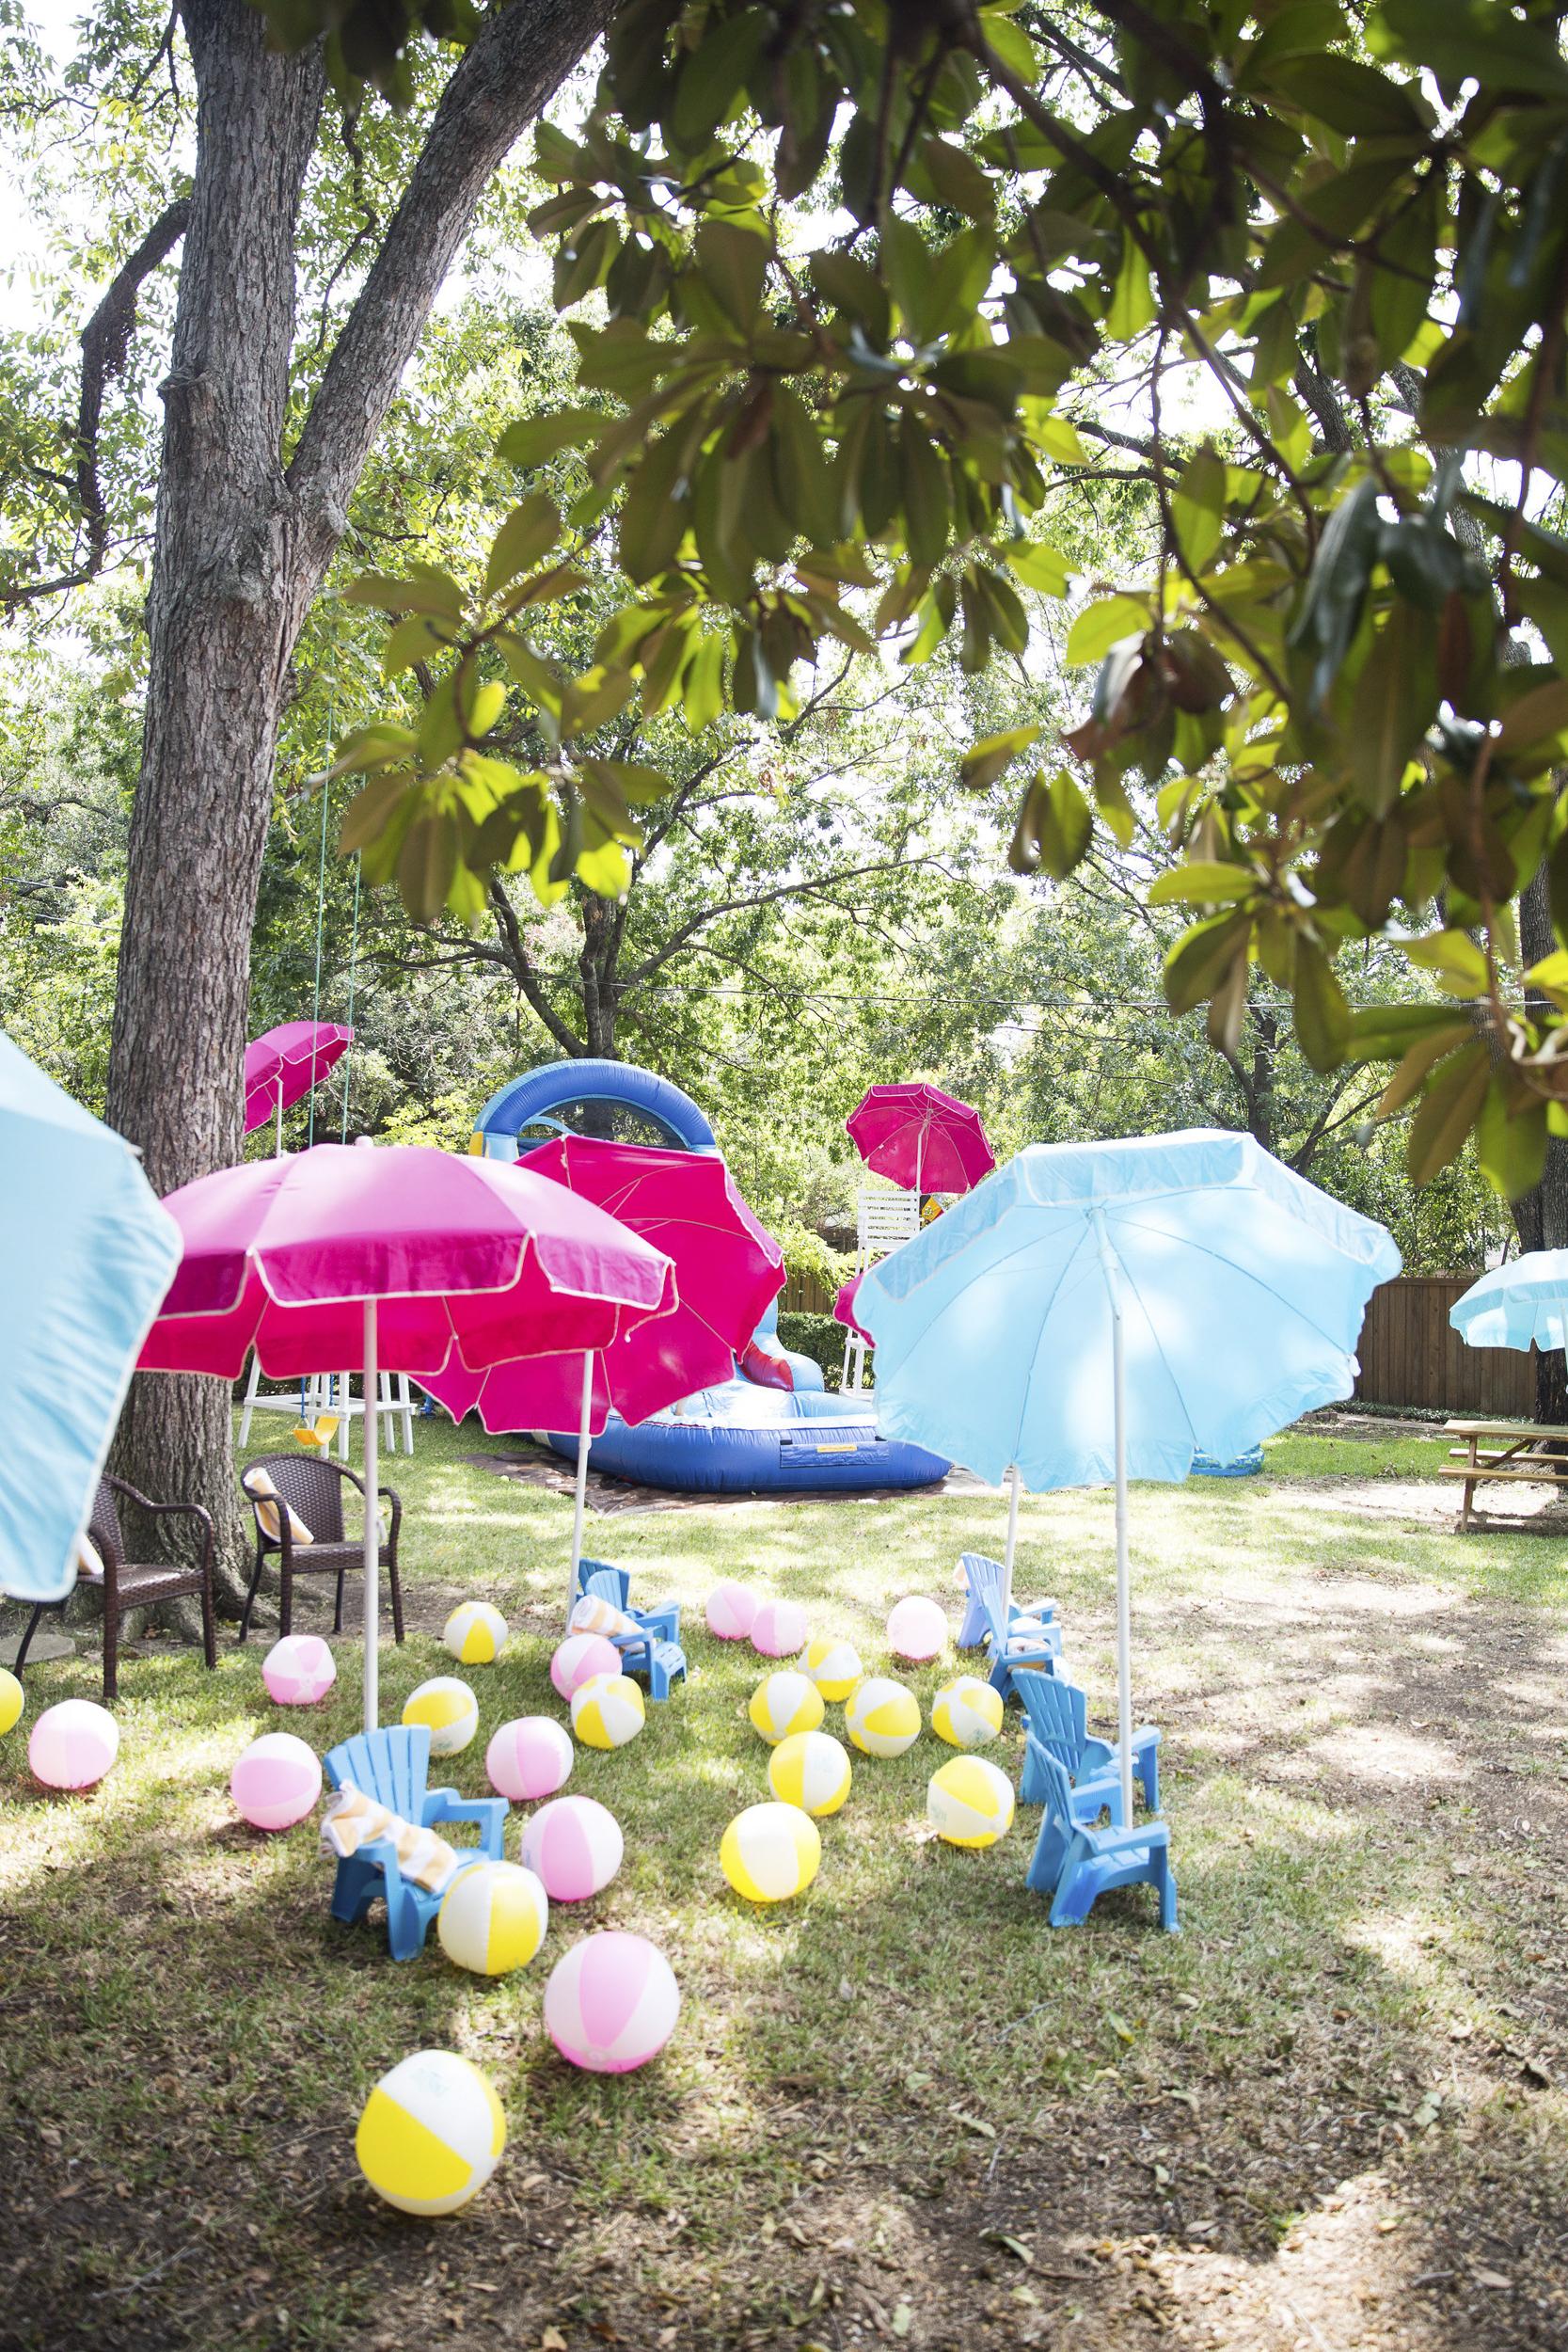 dallas_texas_birthday_party_mae_emily_clarke_events_kids_retro_pool_swim_endless_summer_invitations_ceci_new_york_watercolor_illustration_decor-2.jpg